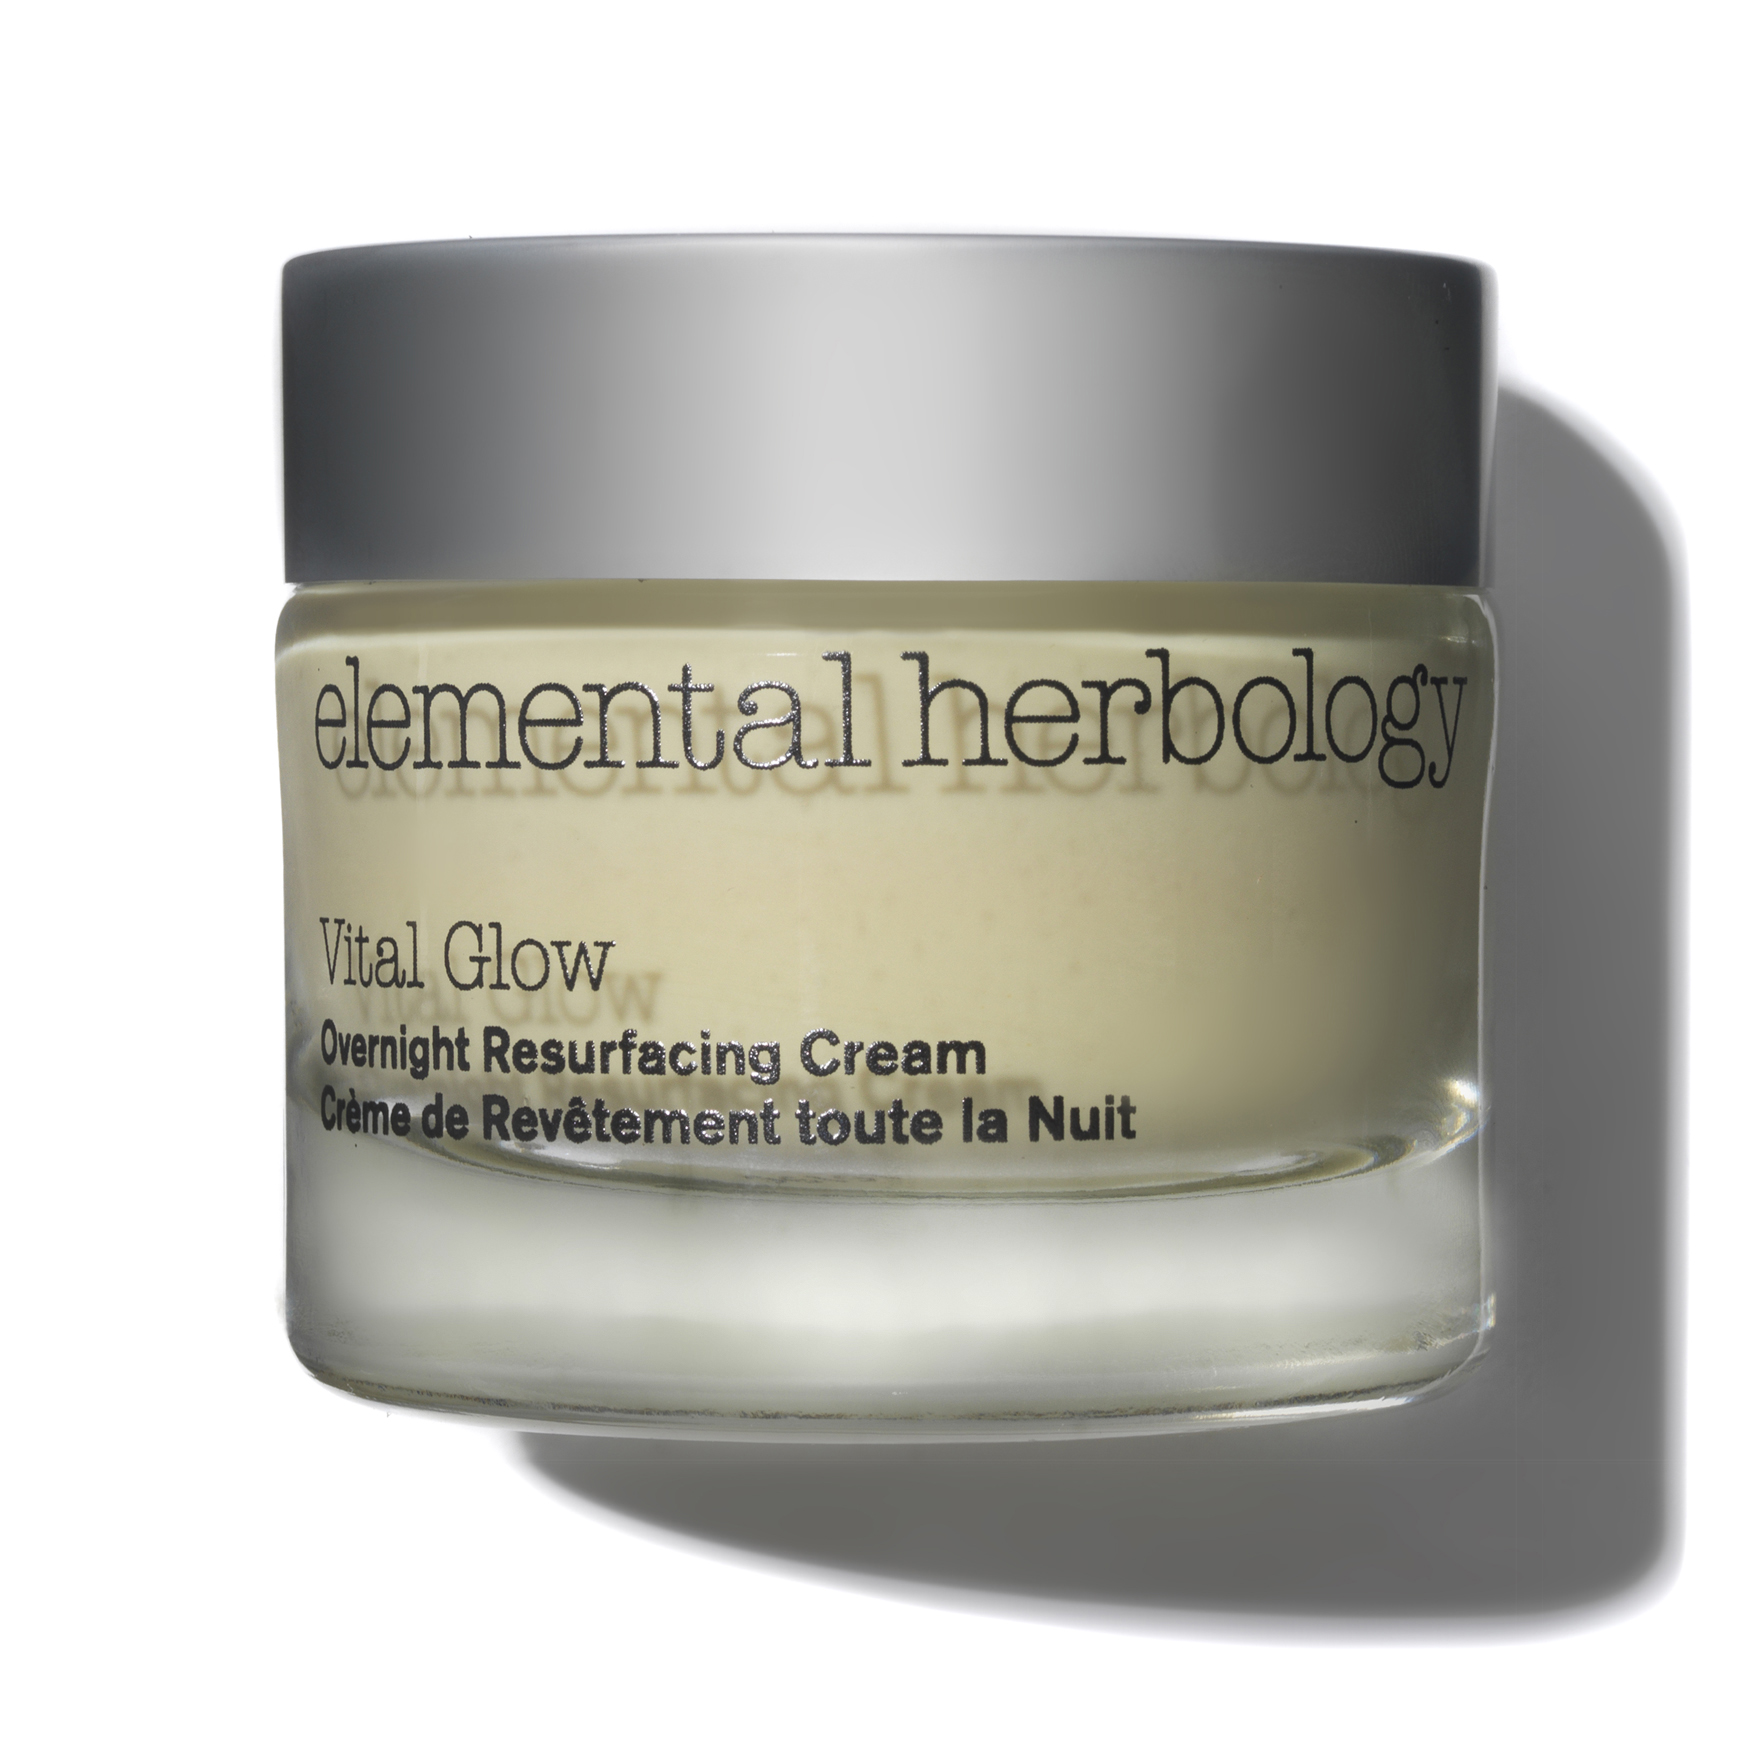 Vital Glow Overnight Resurfacing Cream, , large